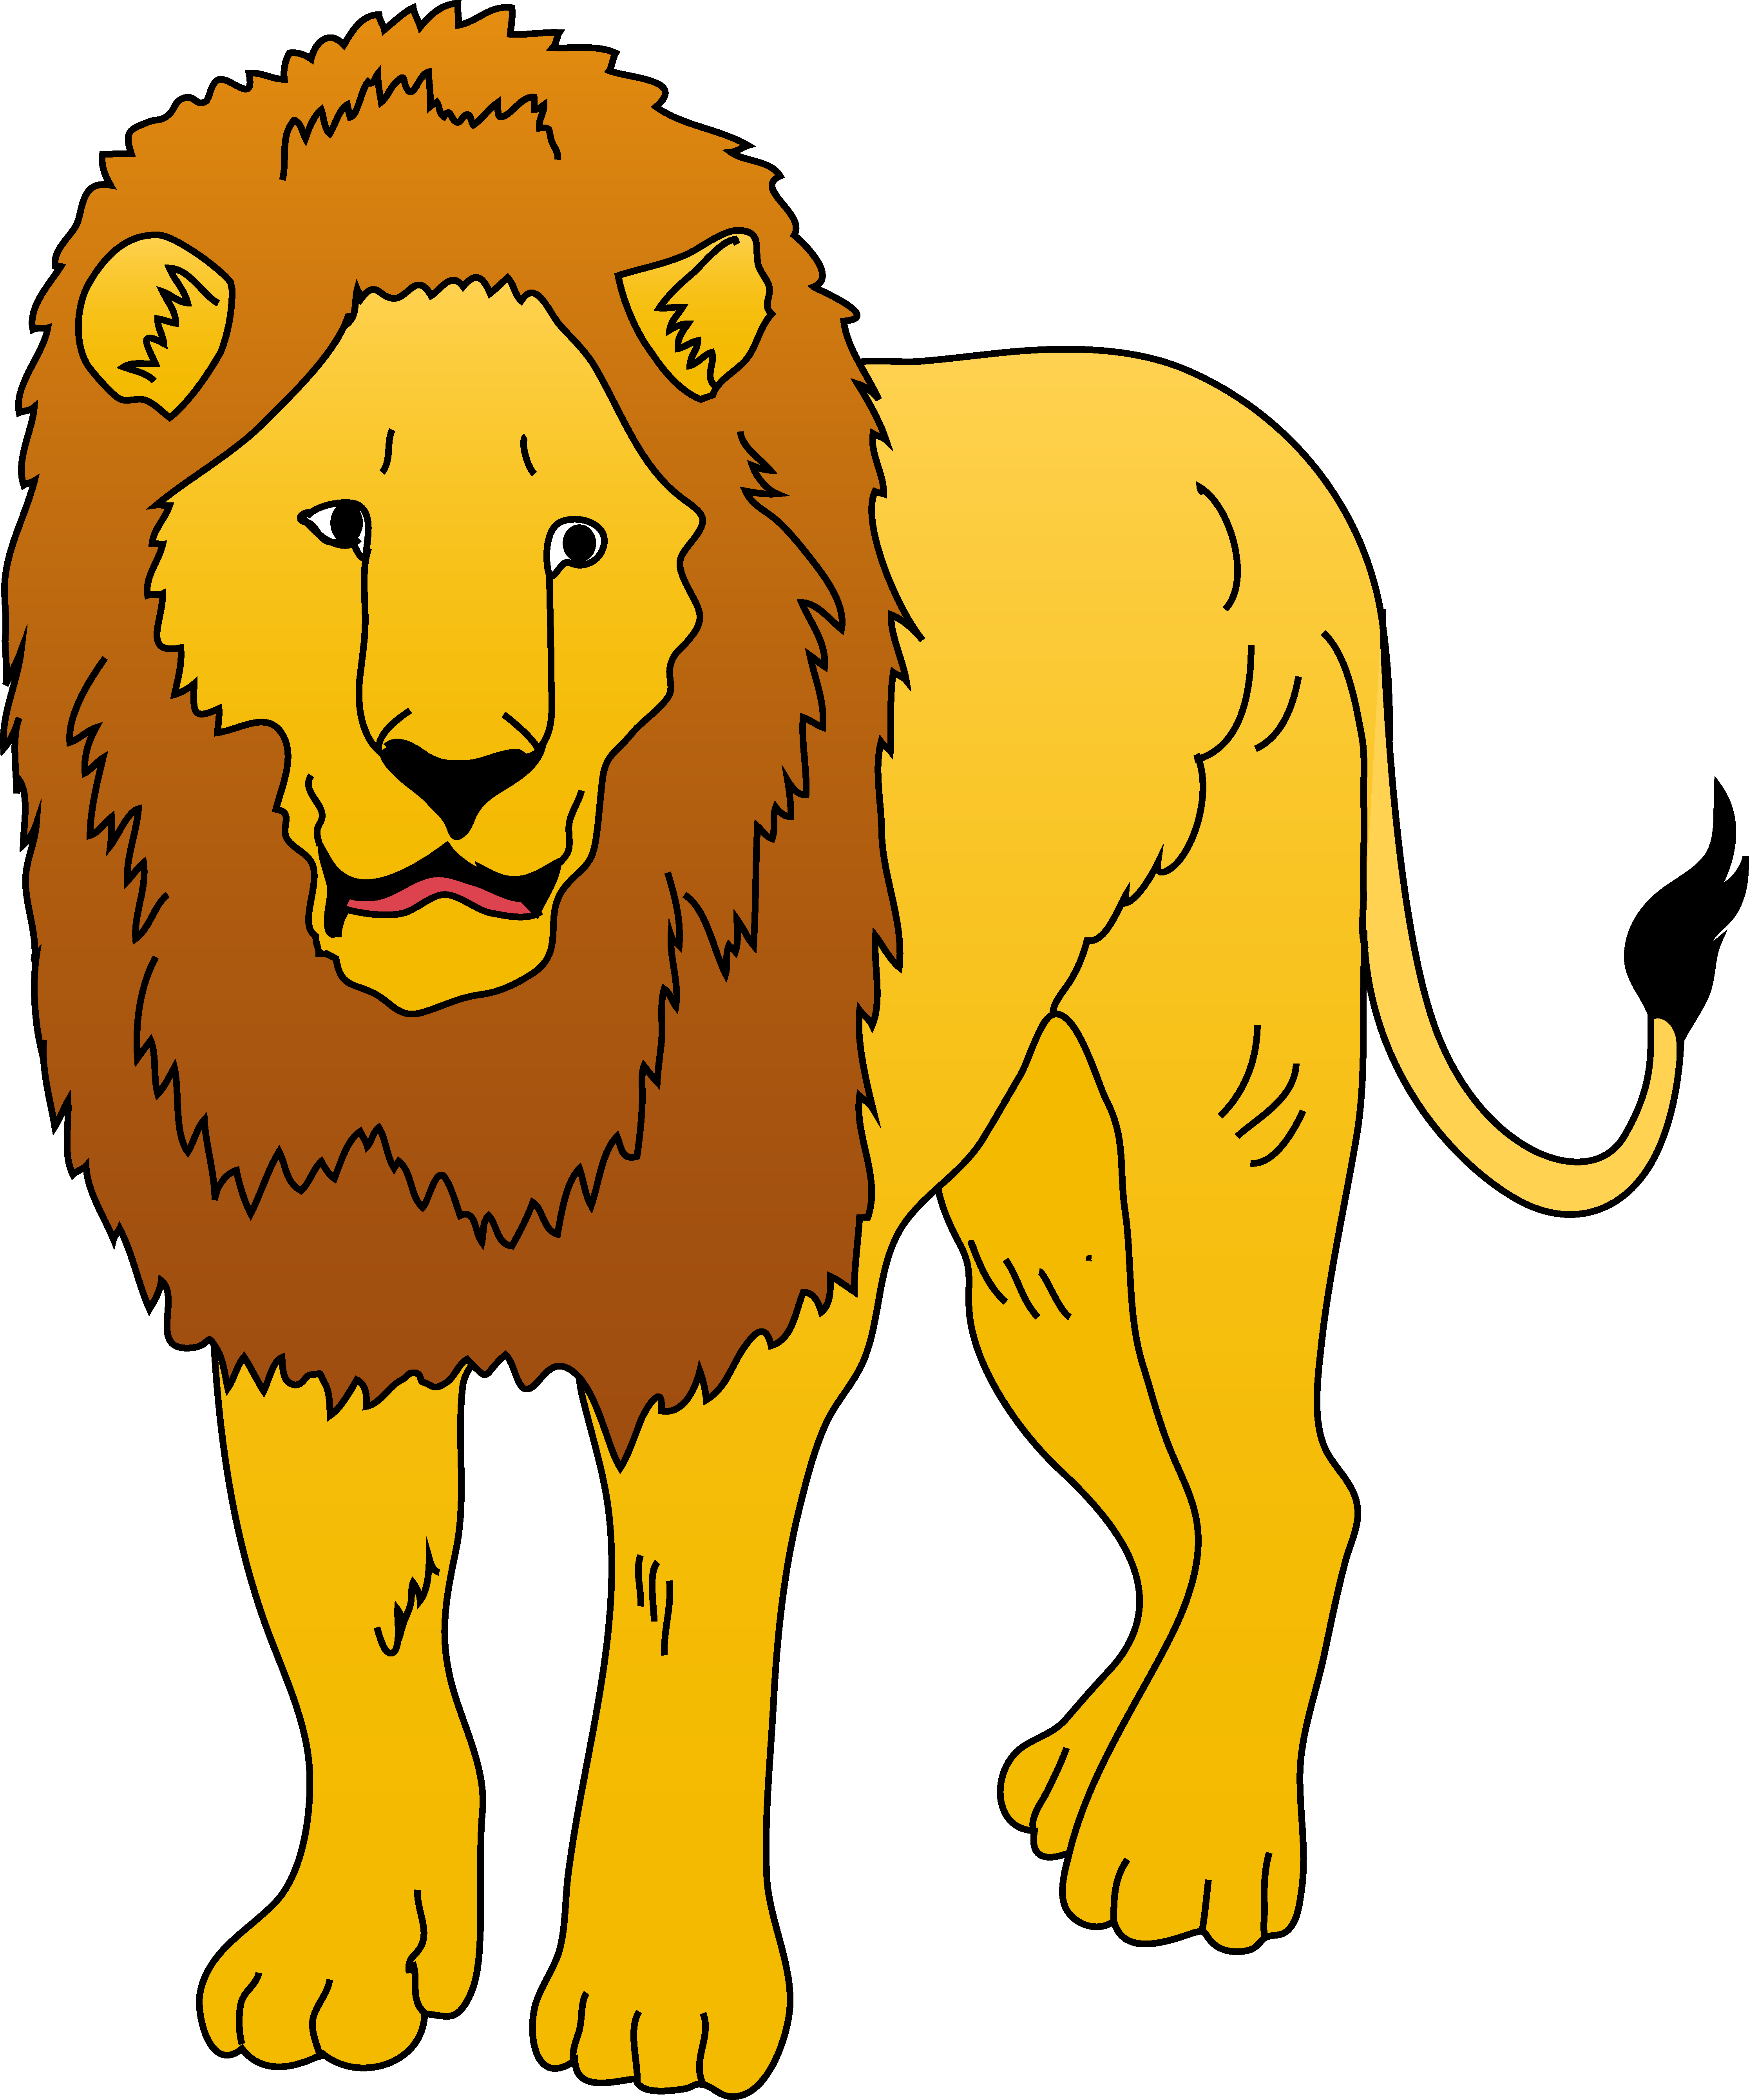 Golden Lion Clipart Illustration Free Cl-Golden lion clipart illustration free clip art-6